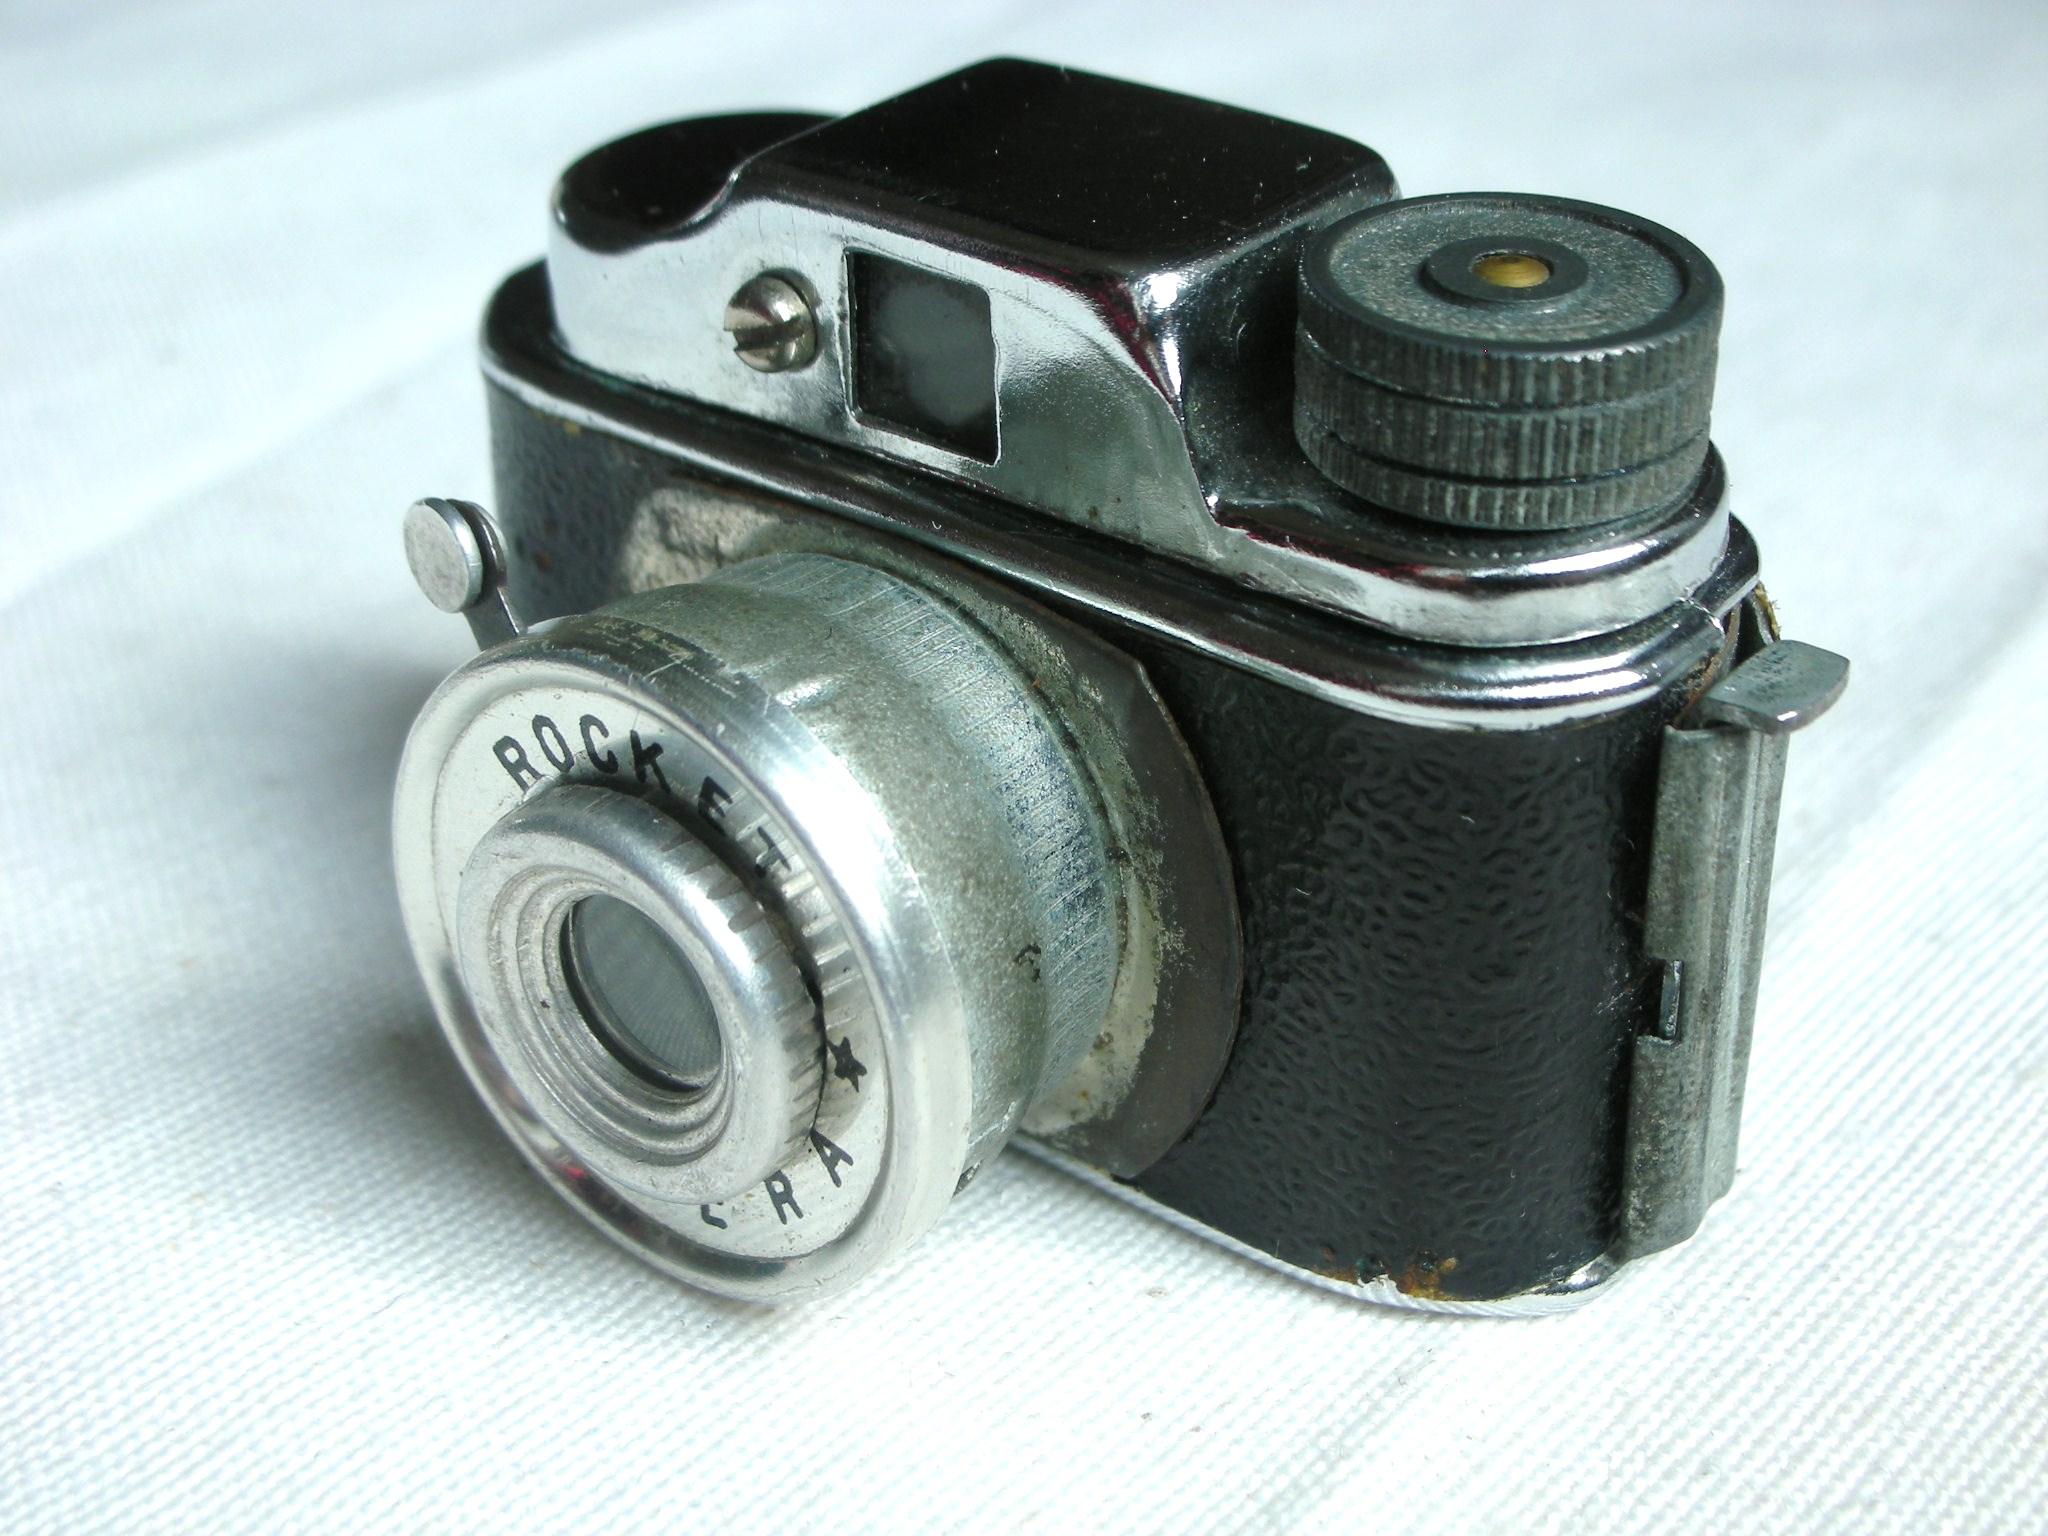 Rocket Camera : Rocket camera click style camera joops camera collection